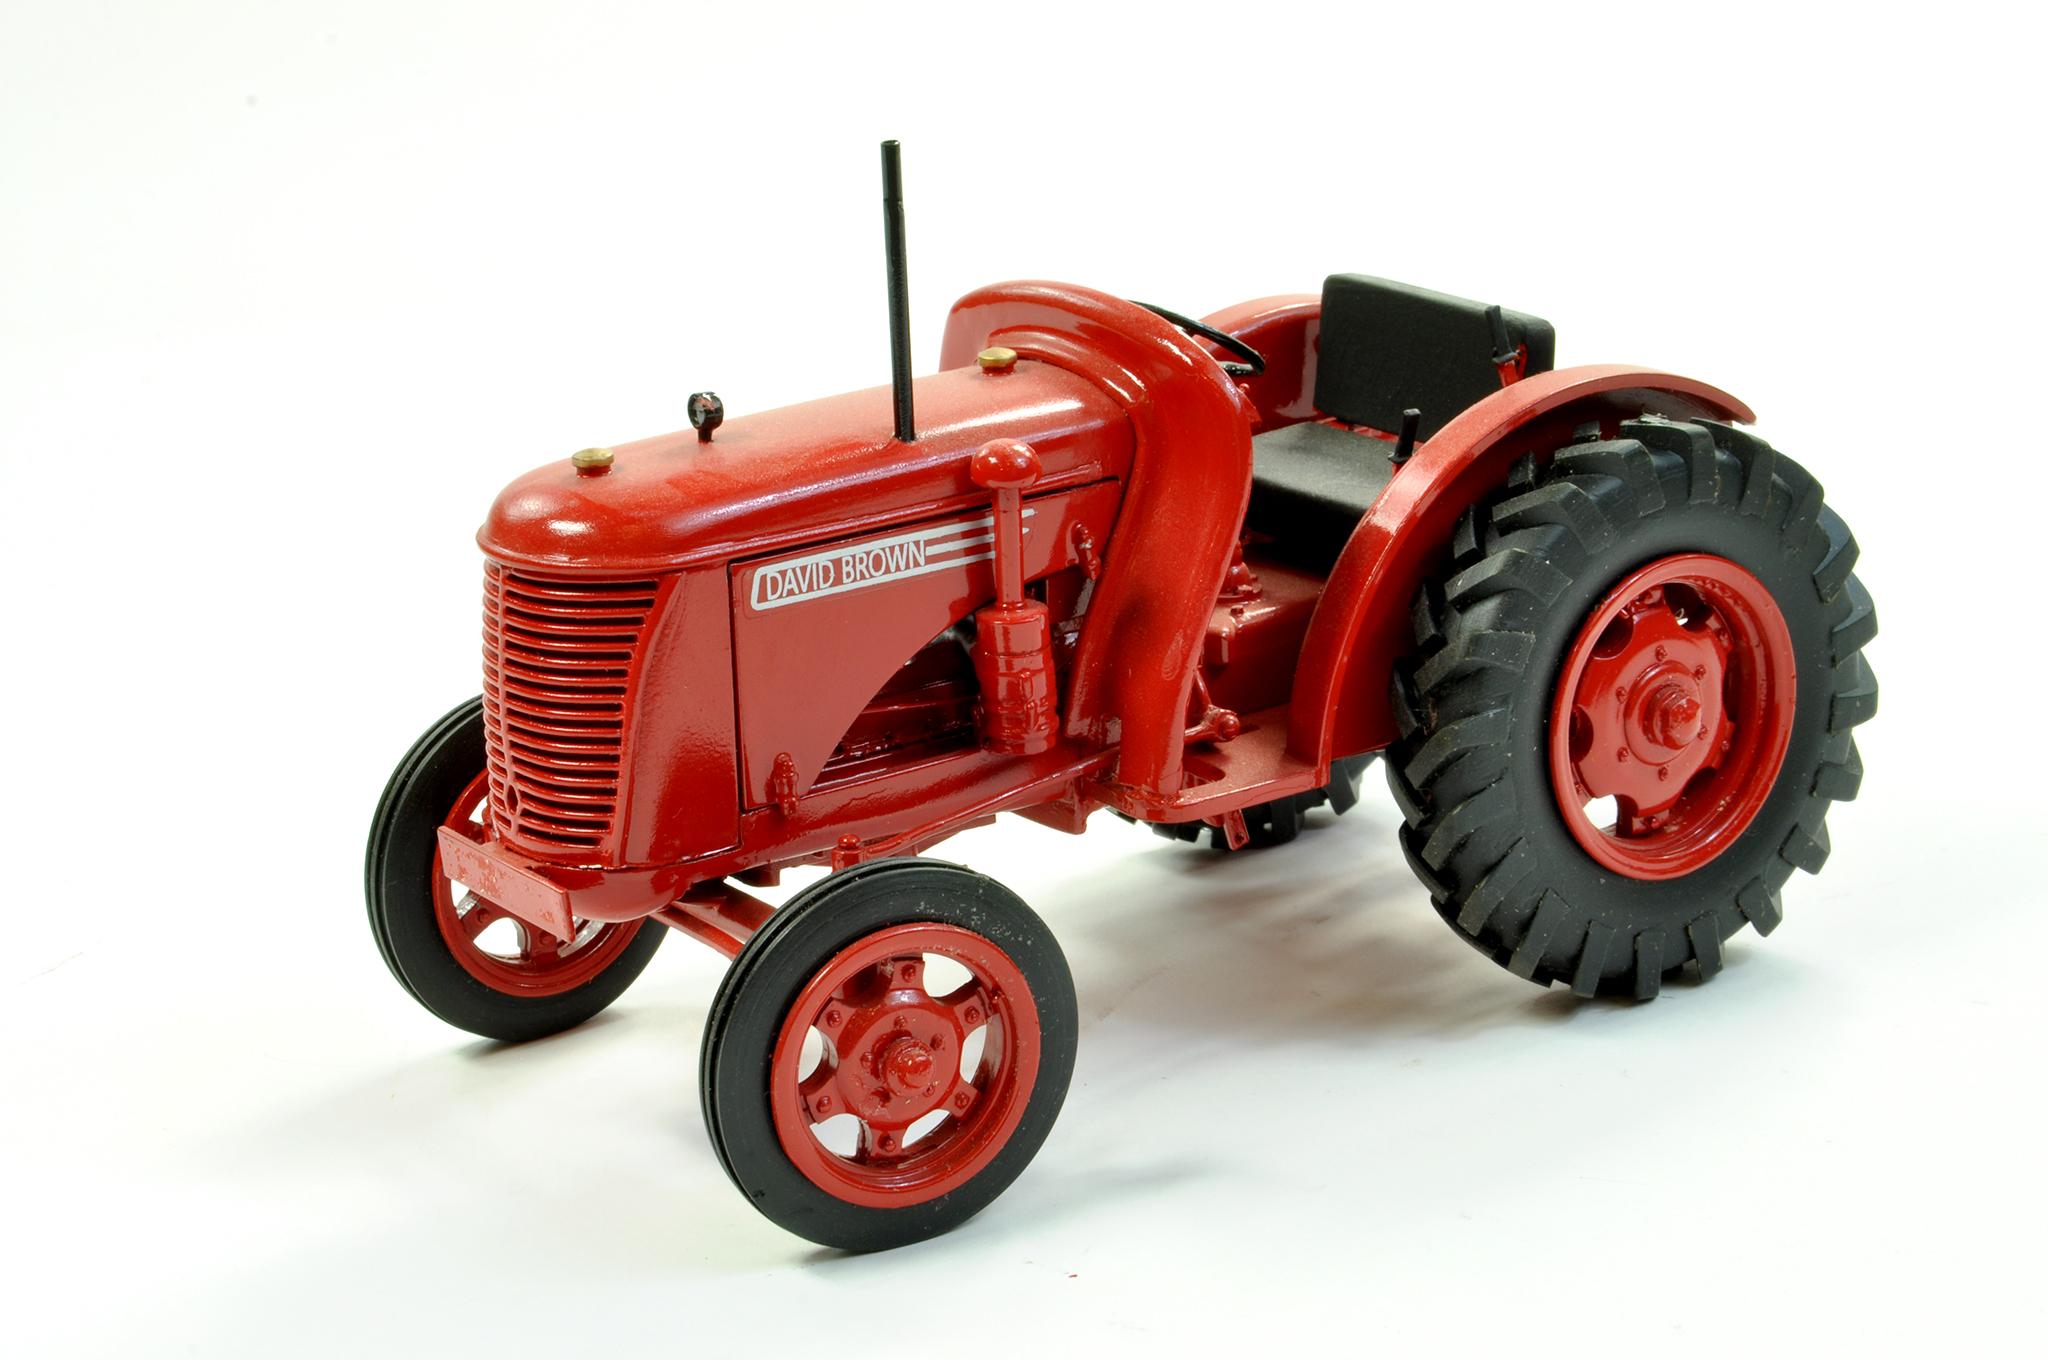 Lot 47 - G&M Originals 1/16 Farm issue comprising David Brown VAK 1 Tractor. Exclusive limited edition,